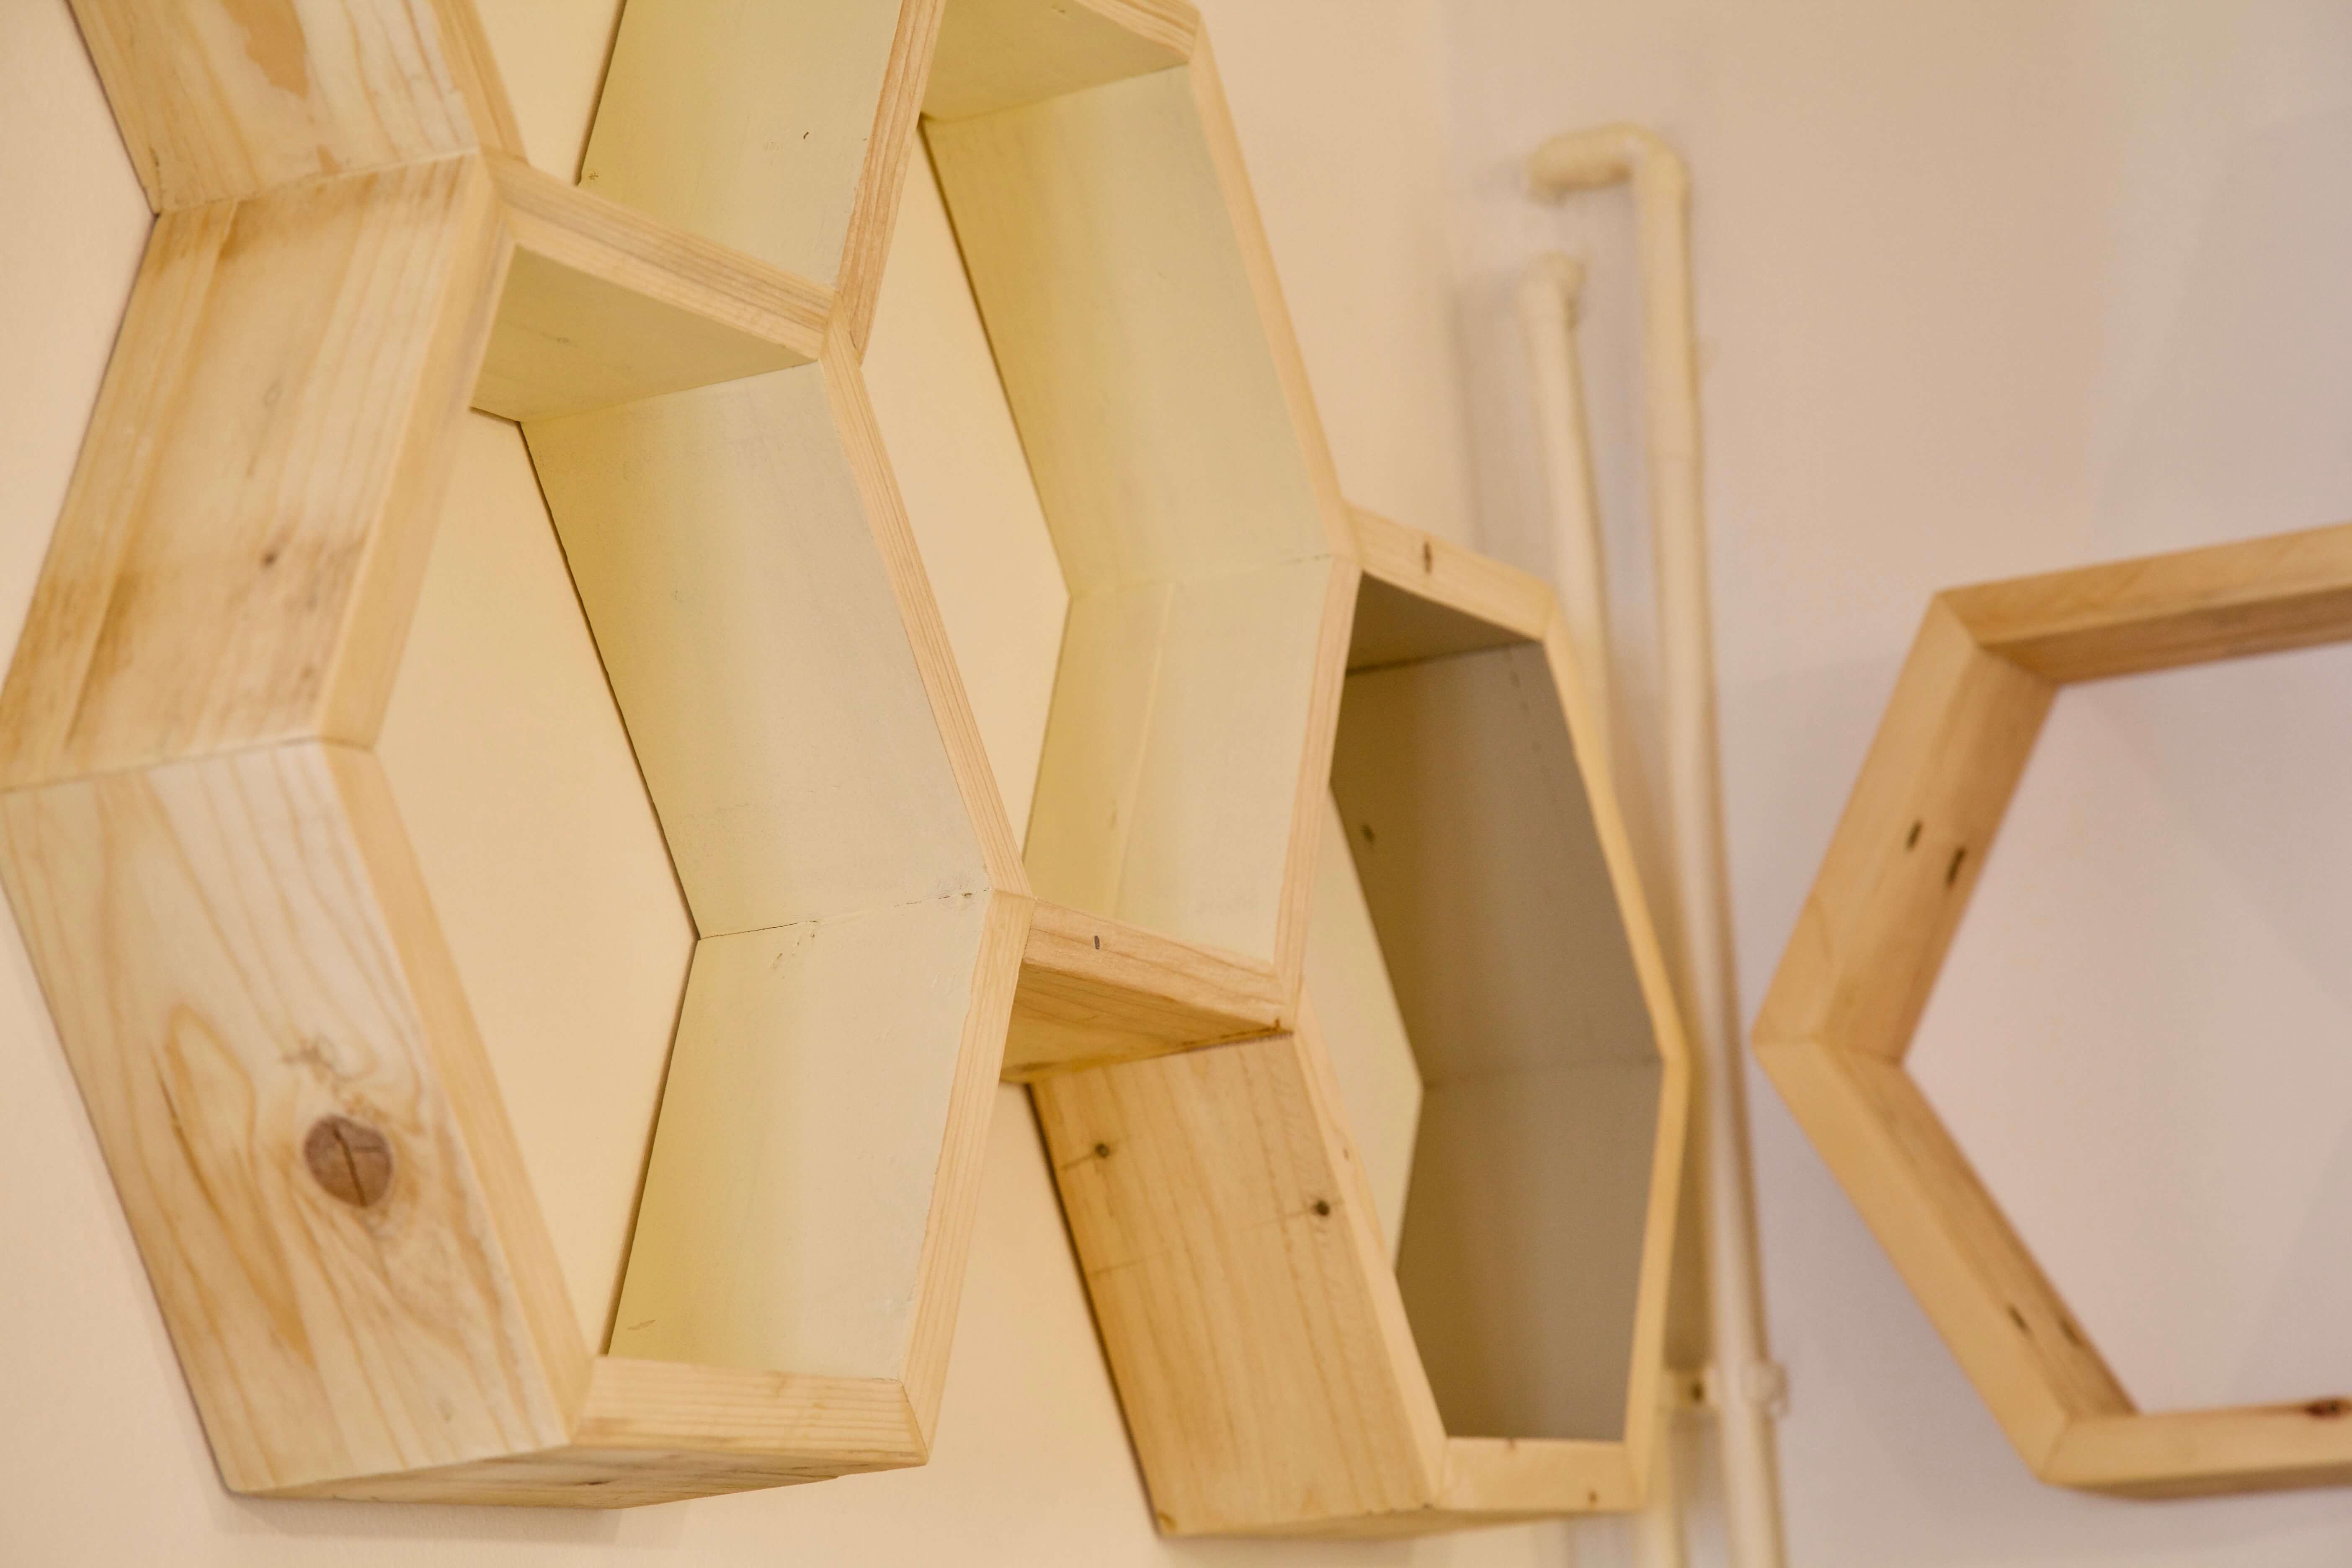 Estanterias con palets panel de estanteras madera natural - Estanterias con palet ...